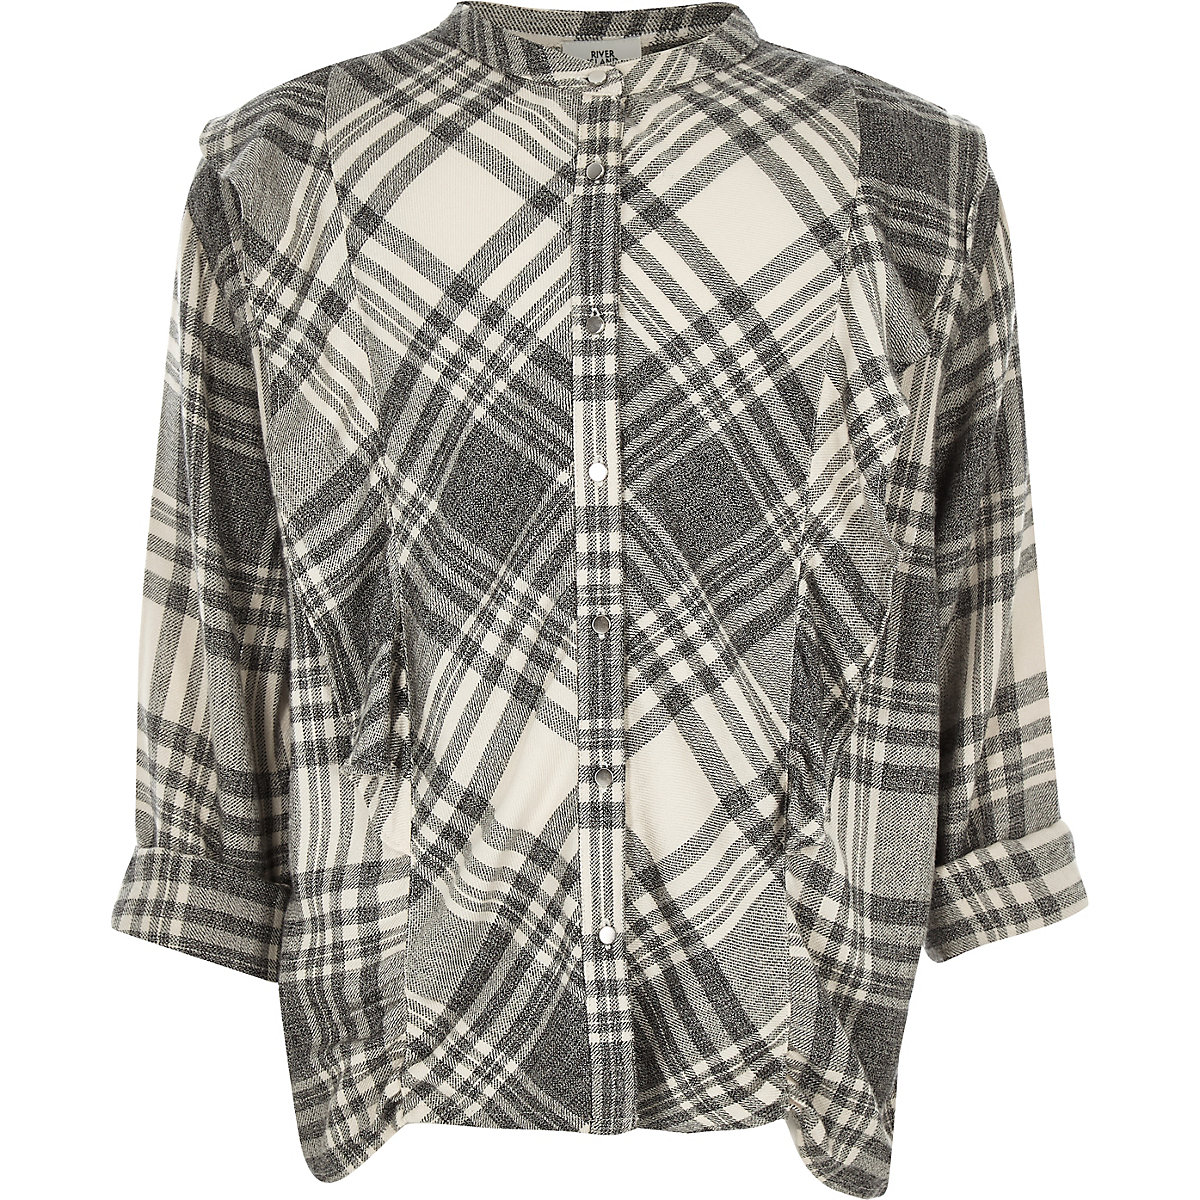 Girls grey check frill shirt